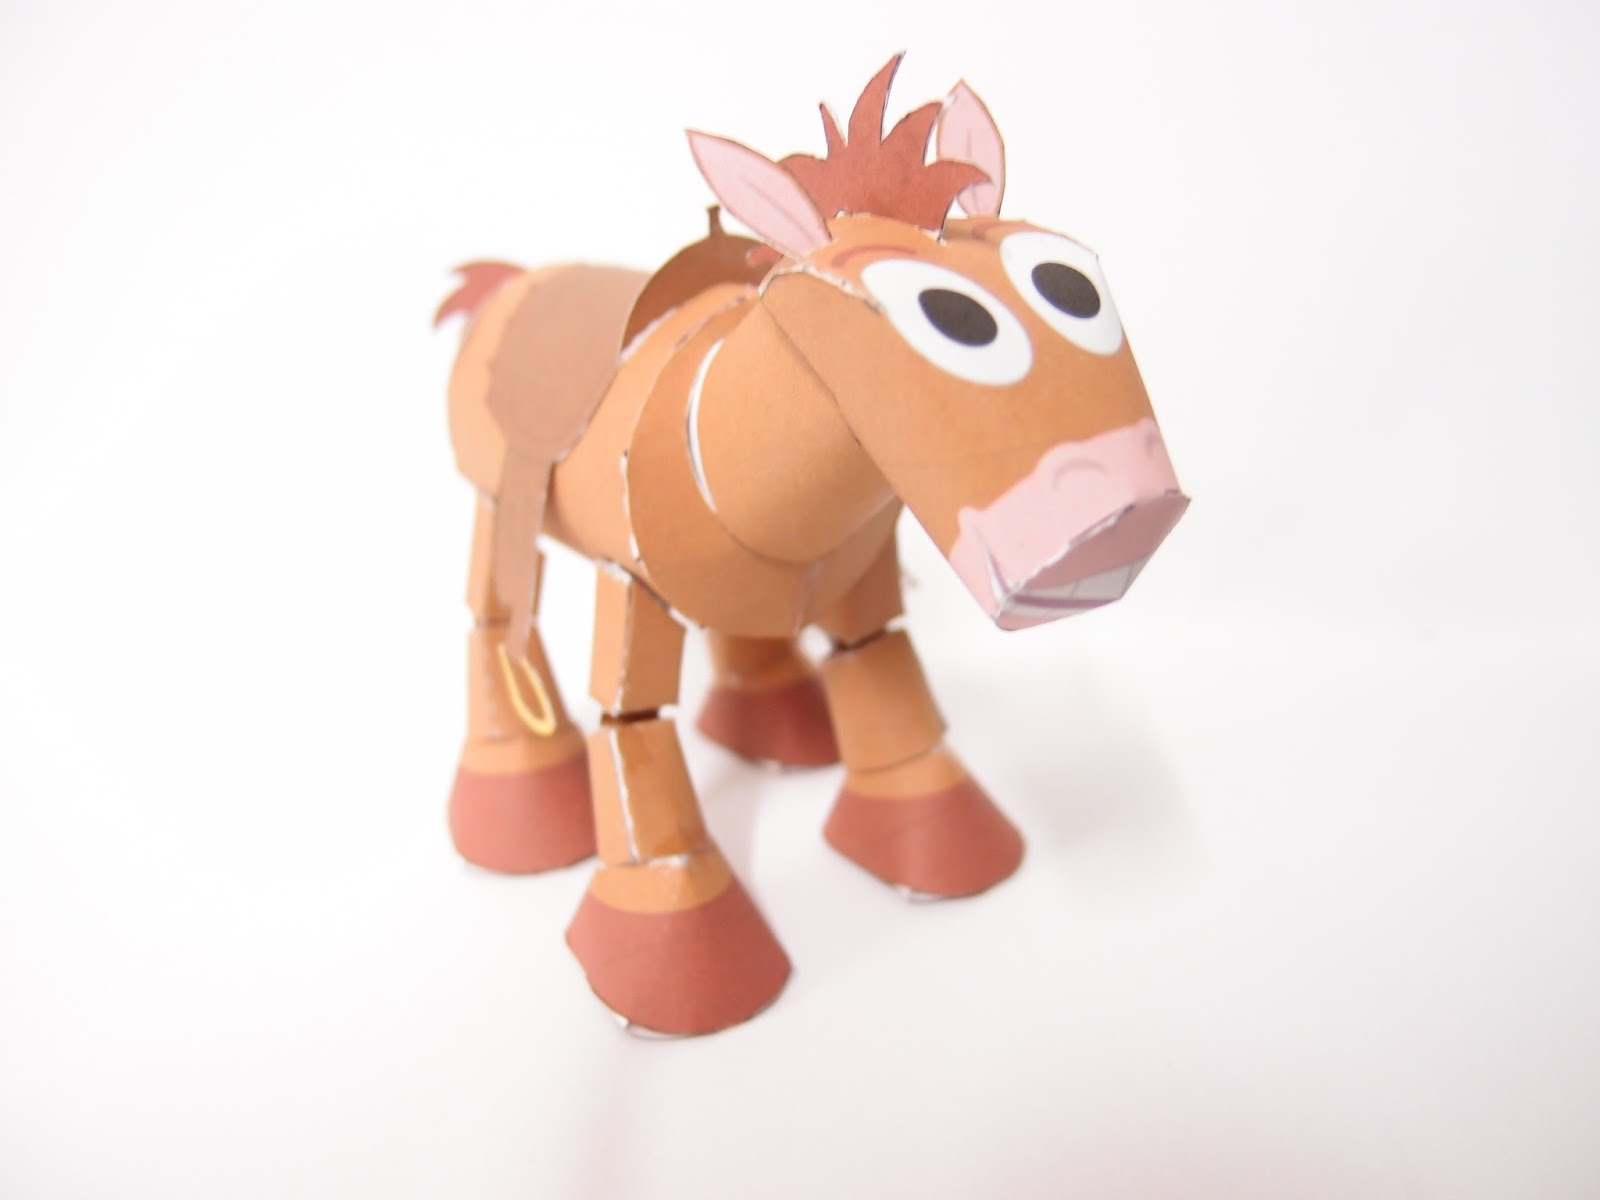 Bullseye Paper Toy